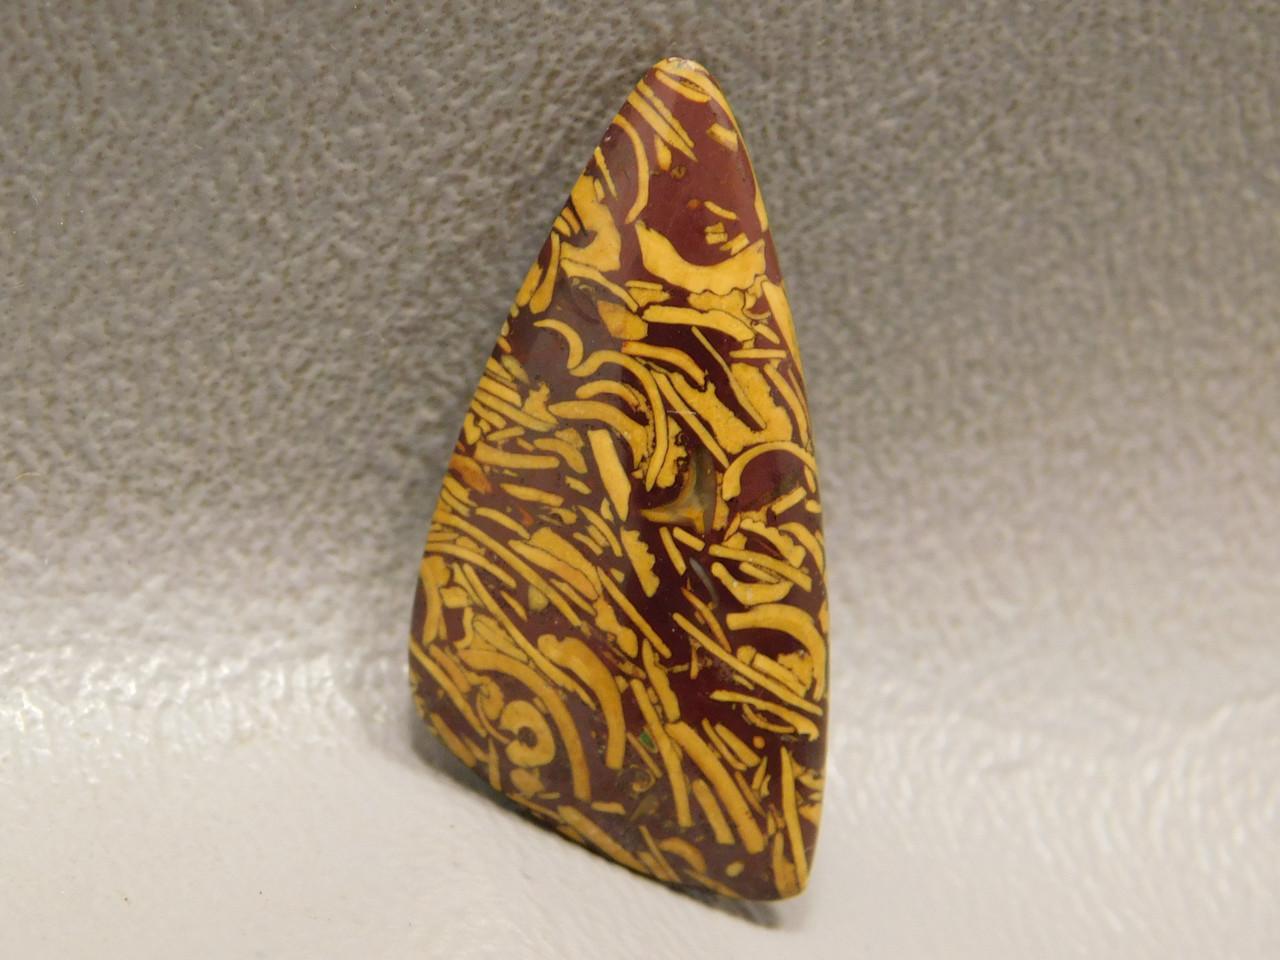 Triangle Cabochon Coquina Jasper Script Stone for Jewelry Making #10